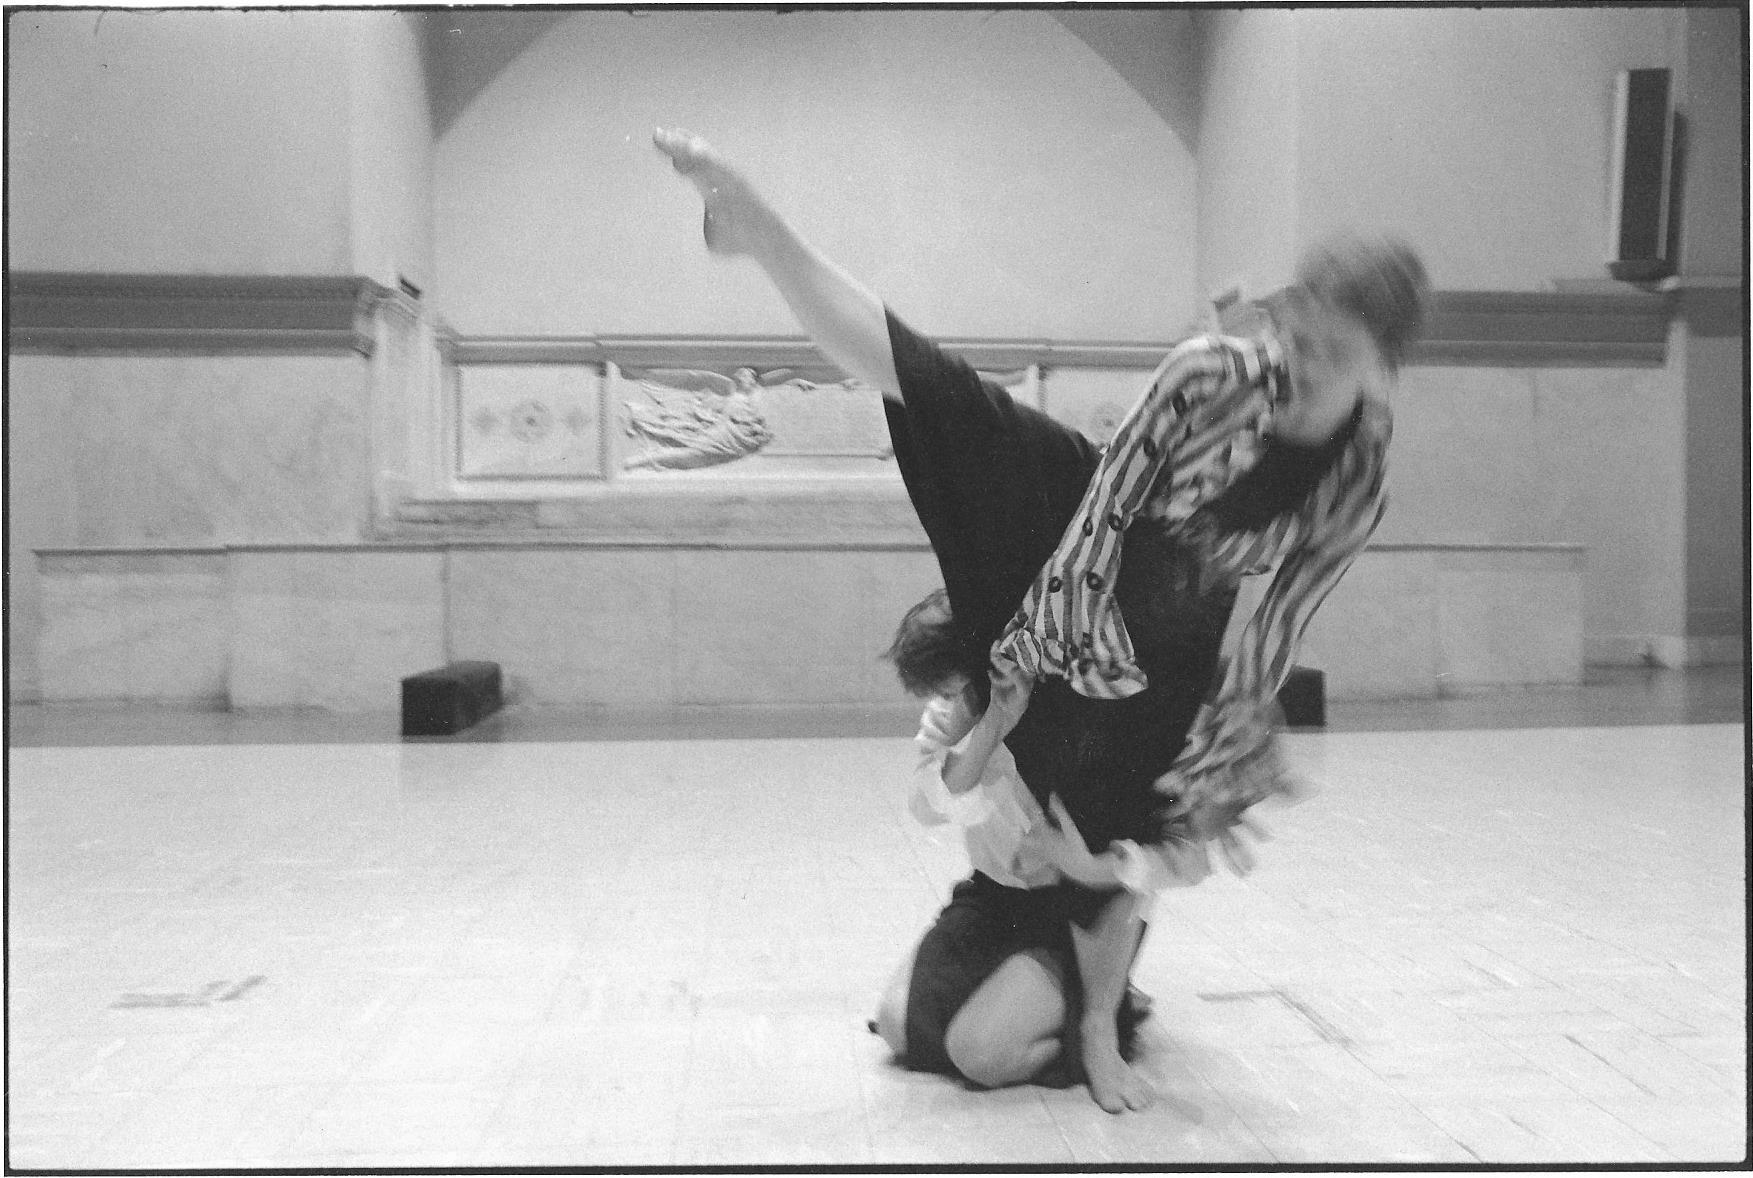 Winding Mossy Ways at Judson - 1995 Anja Hitzenberger0002.jpg